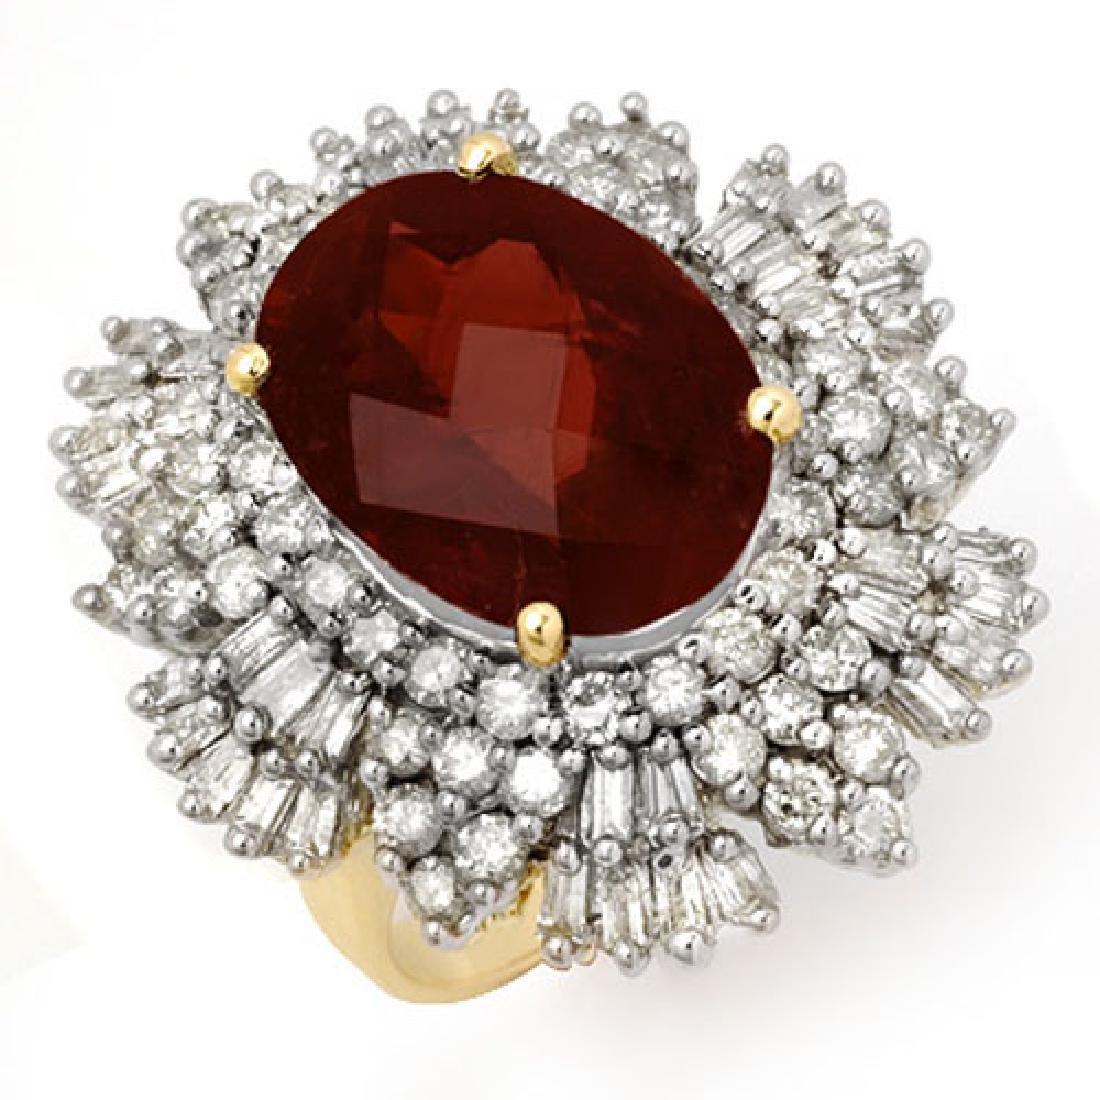 13.25 CTW Pink Tourmaline & Diamond Ring 14K Yellow